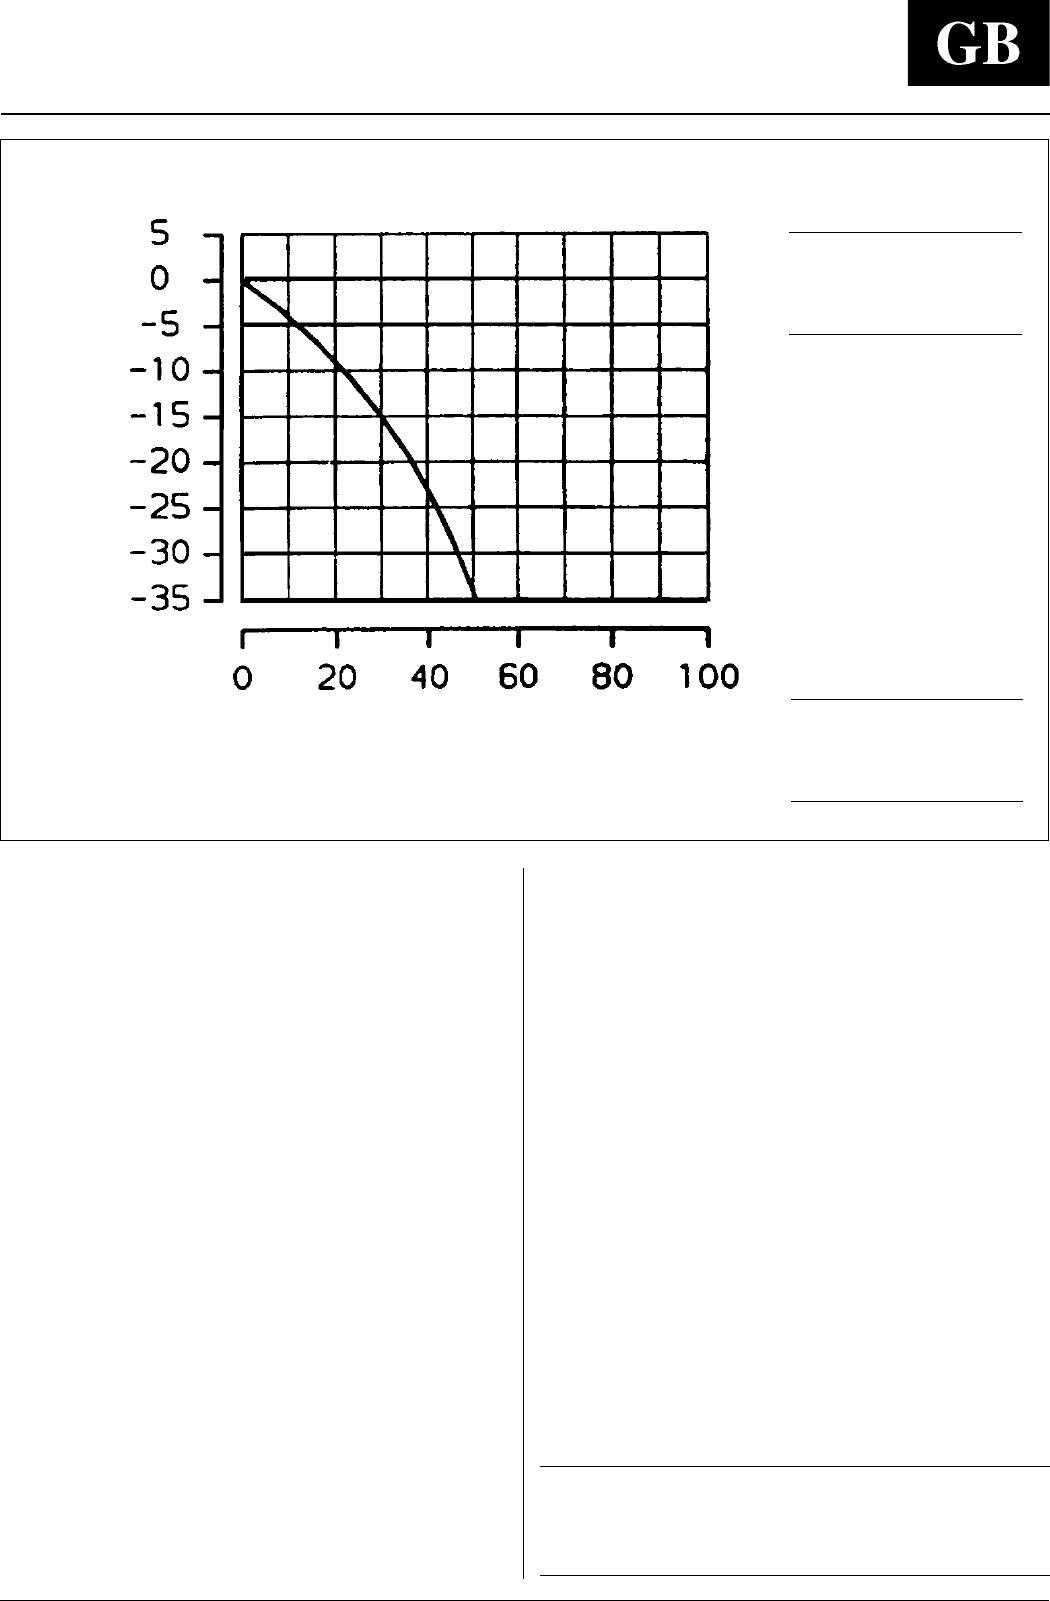 carrier 30ra wiring diagram single pole aquasnap users manual gb rh p65 30rh